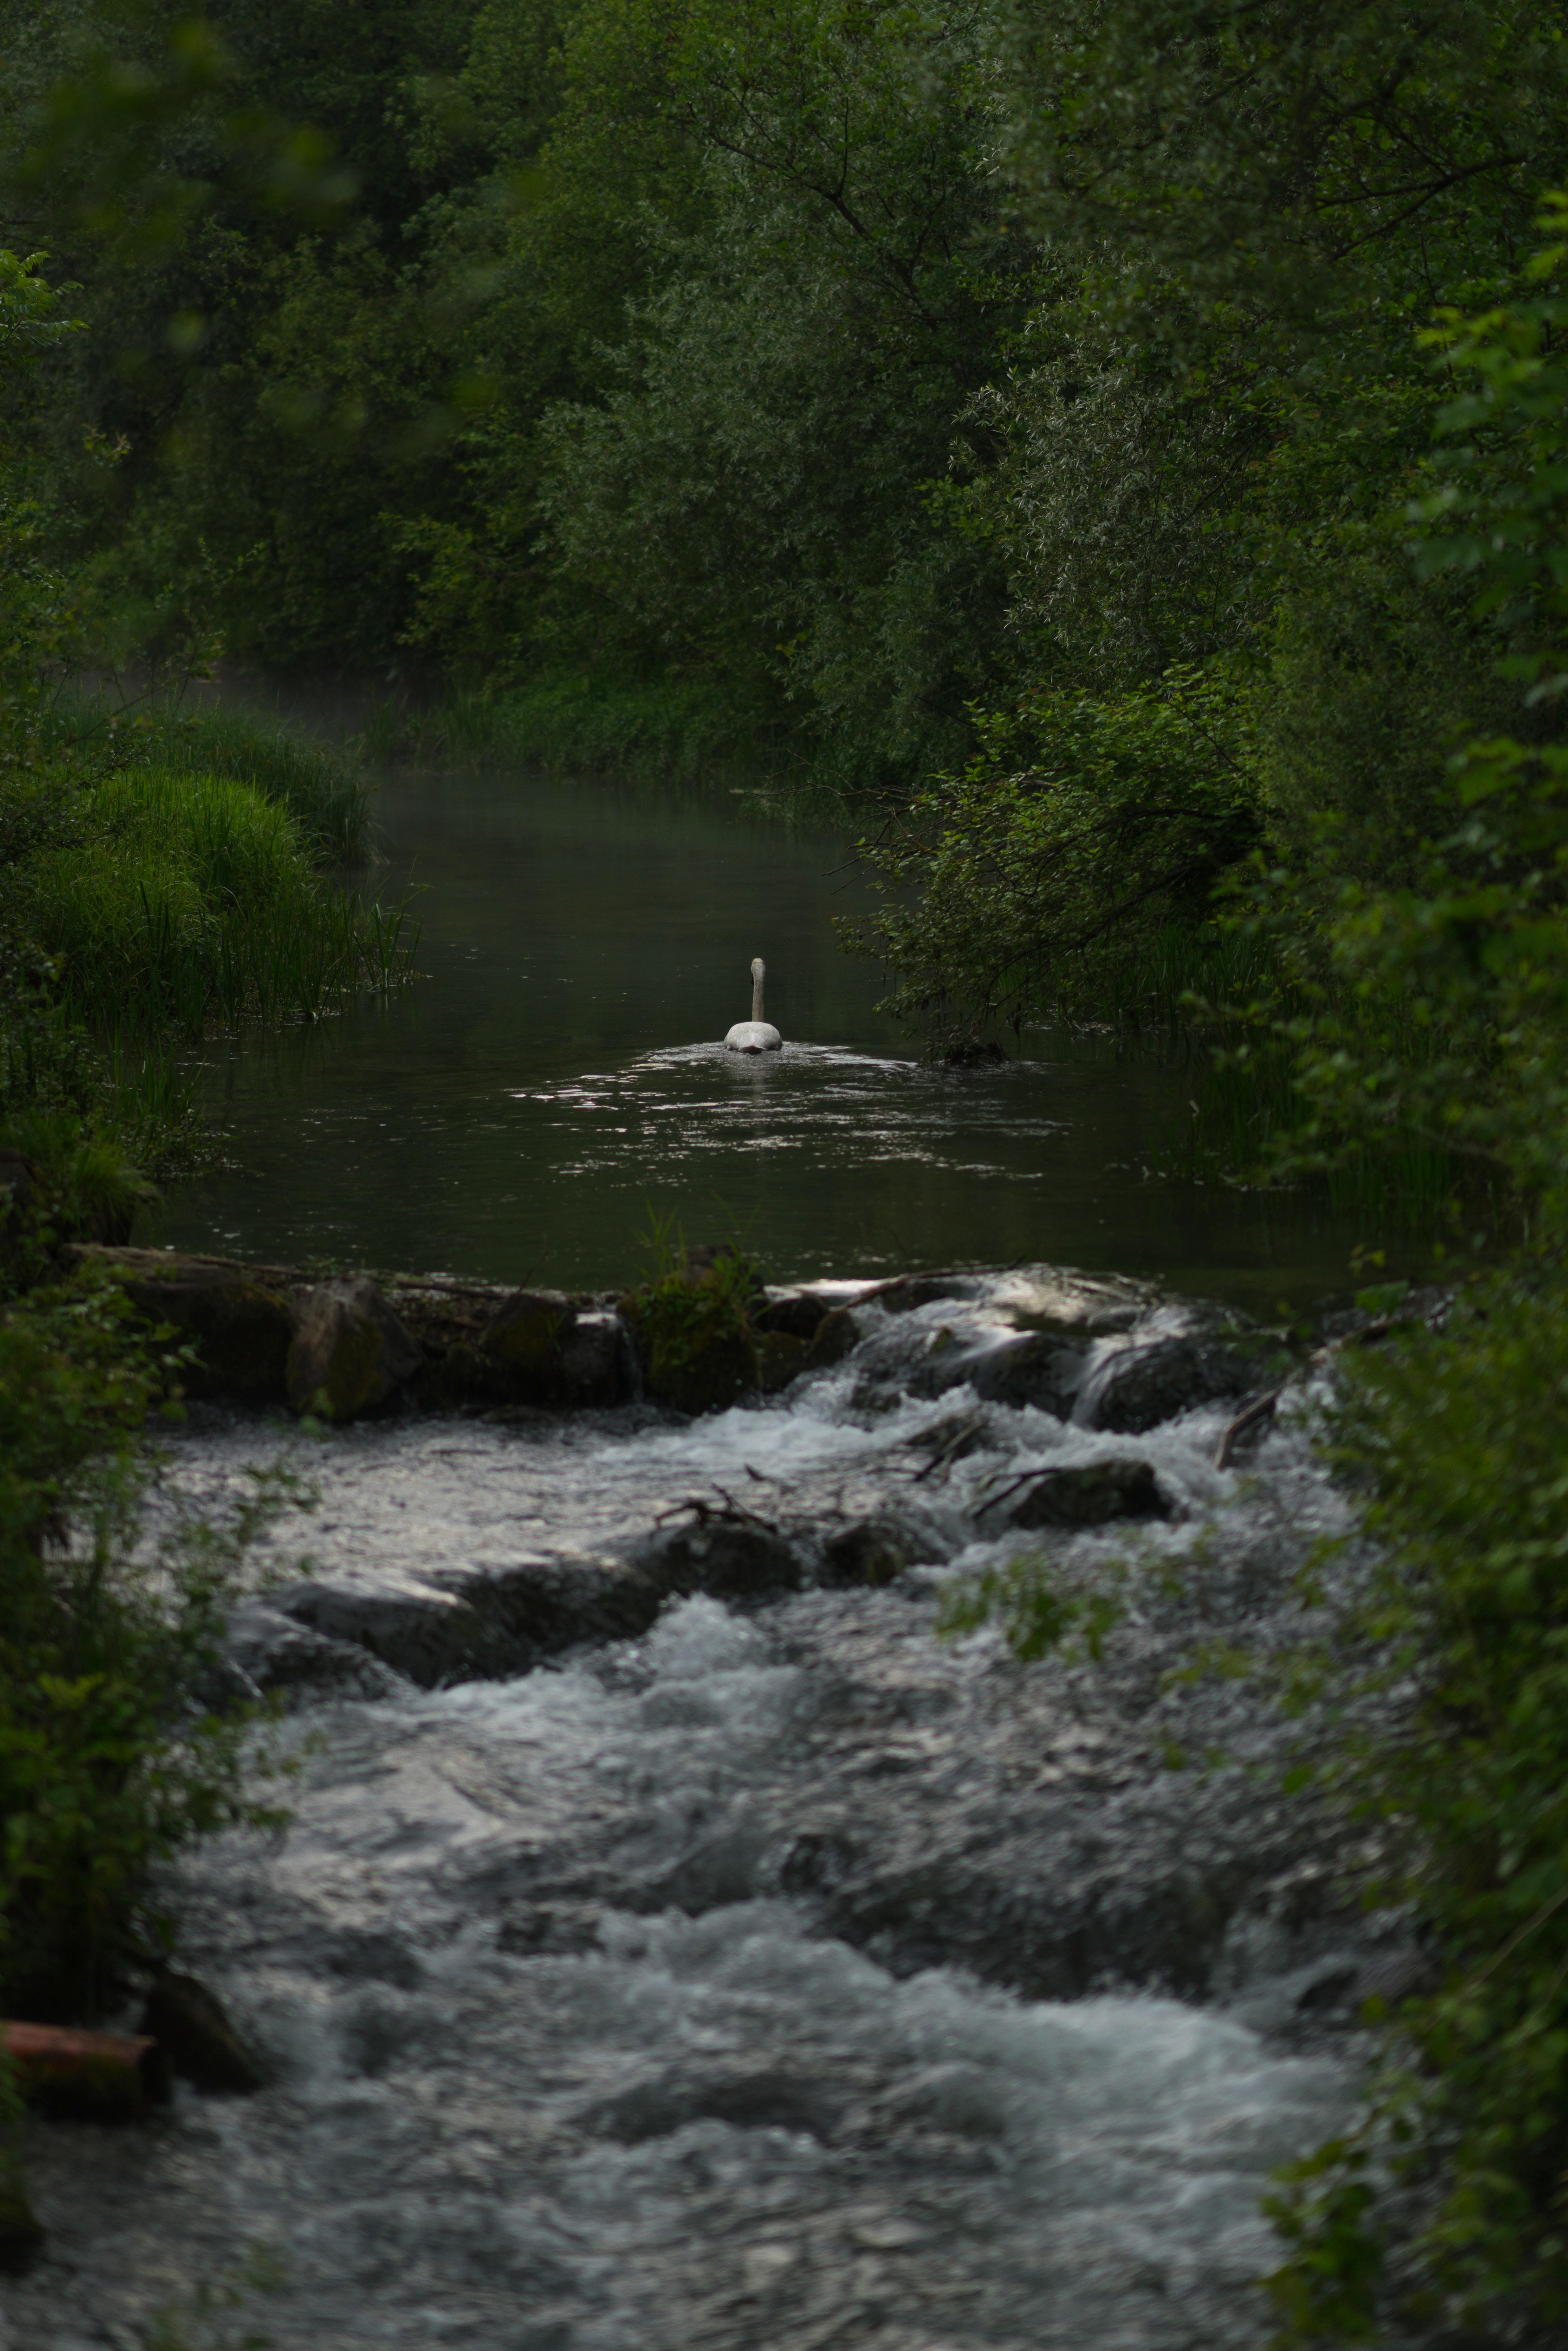 swan galloping on river wallpaper